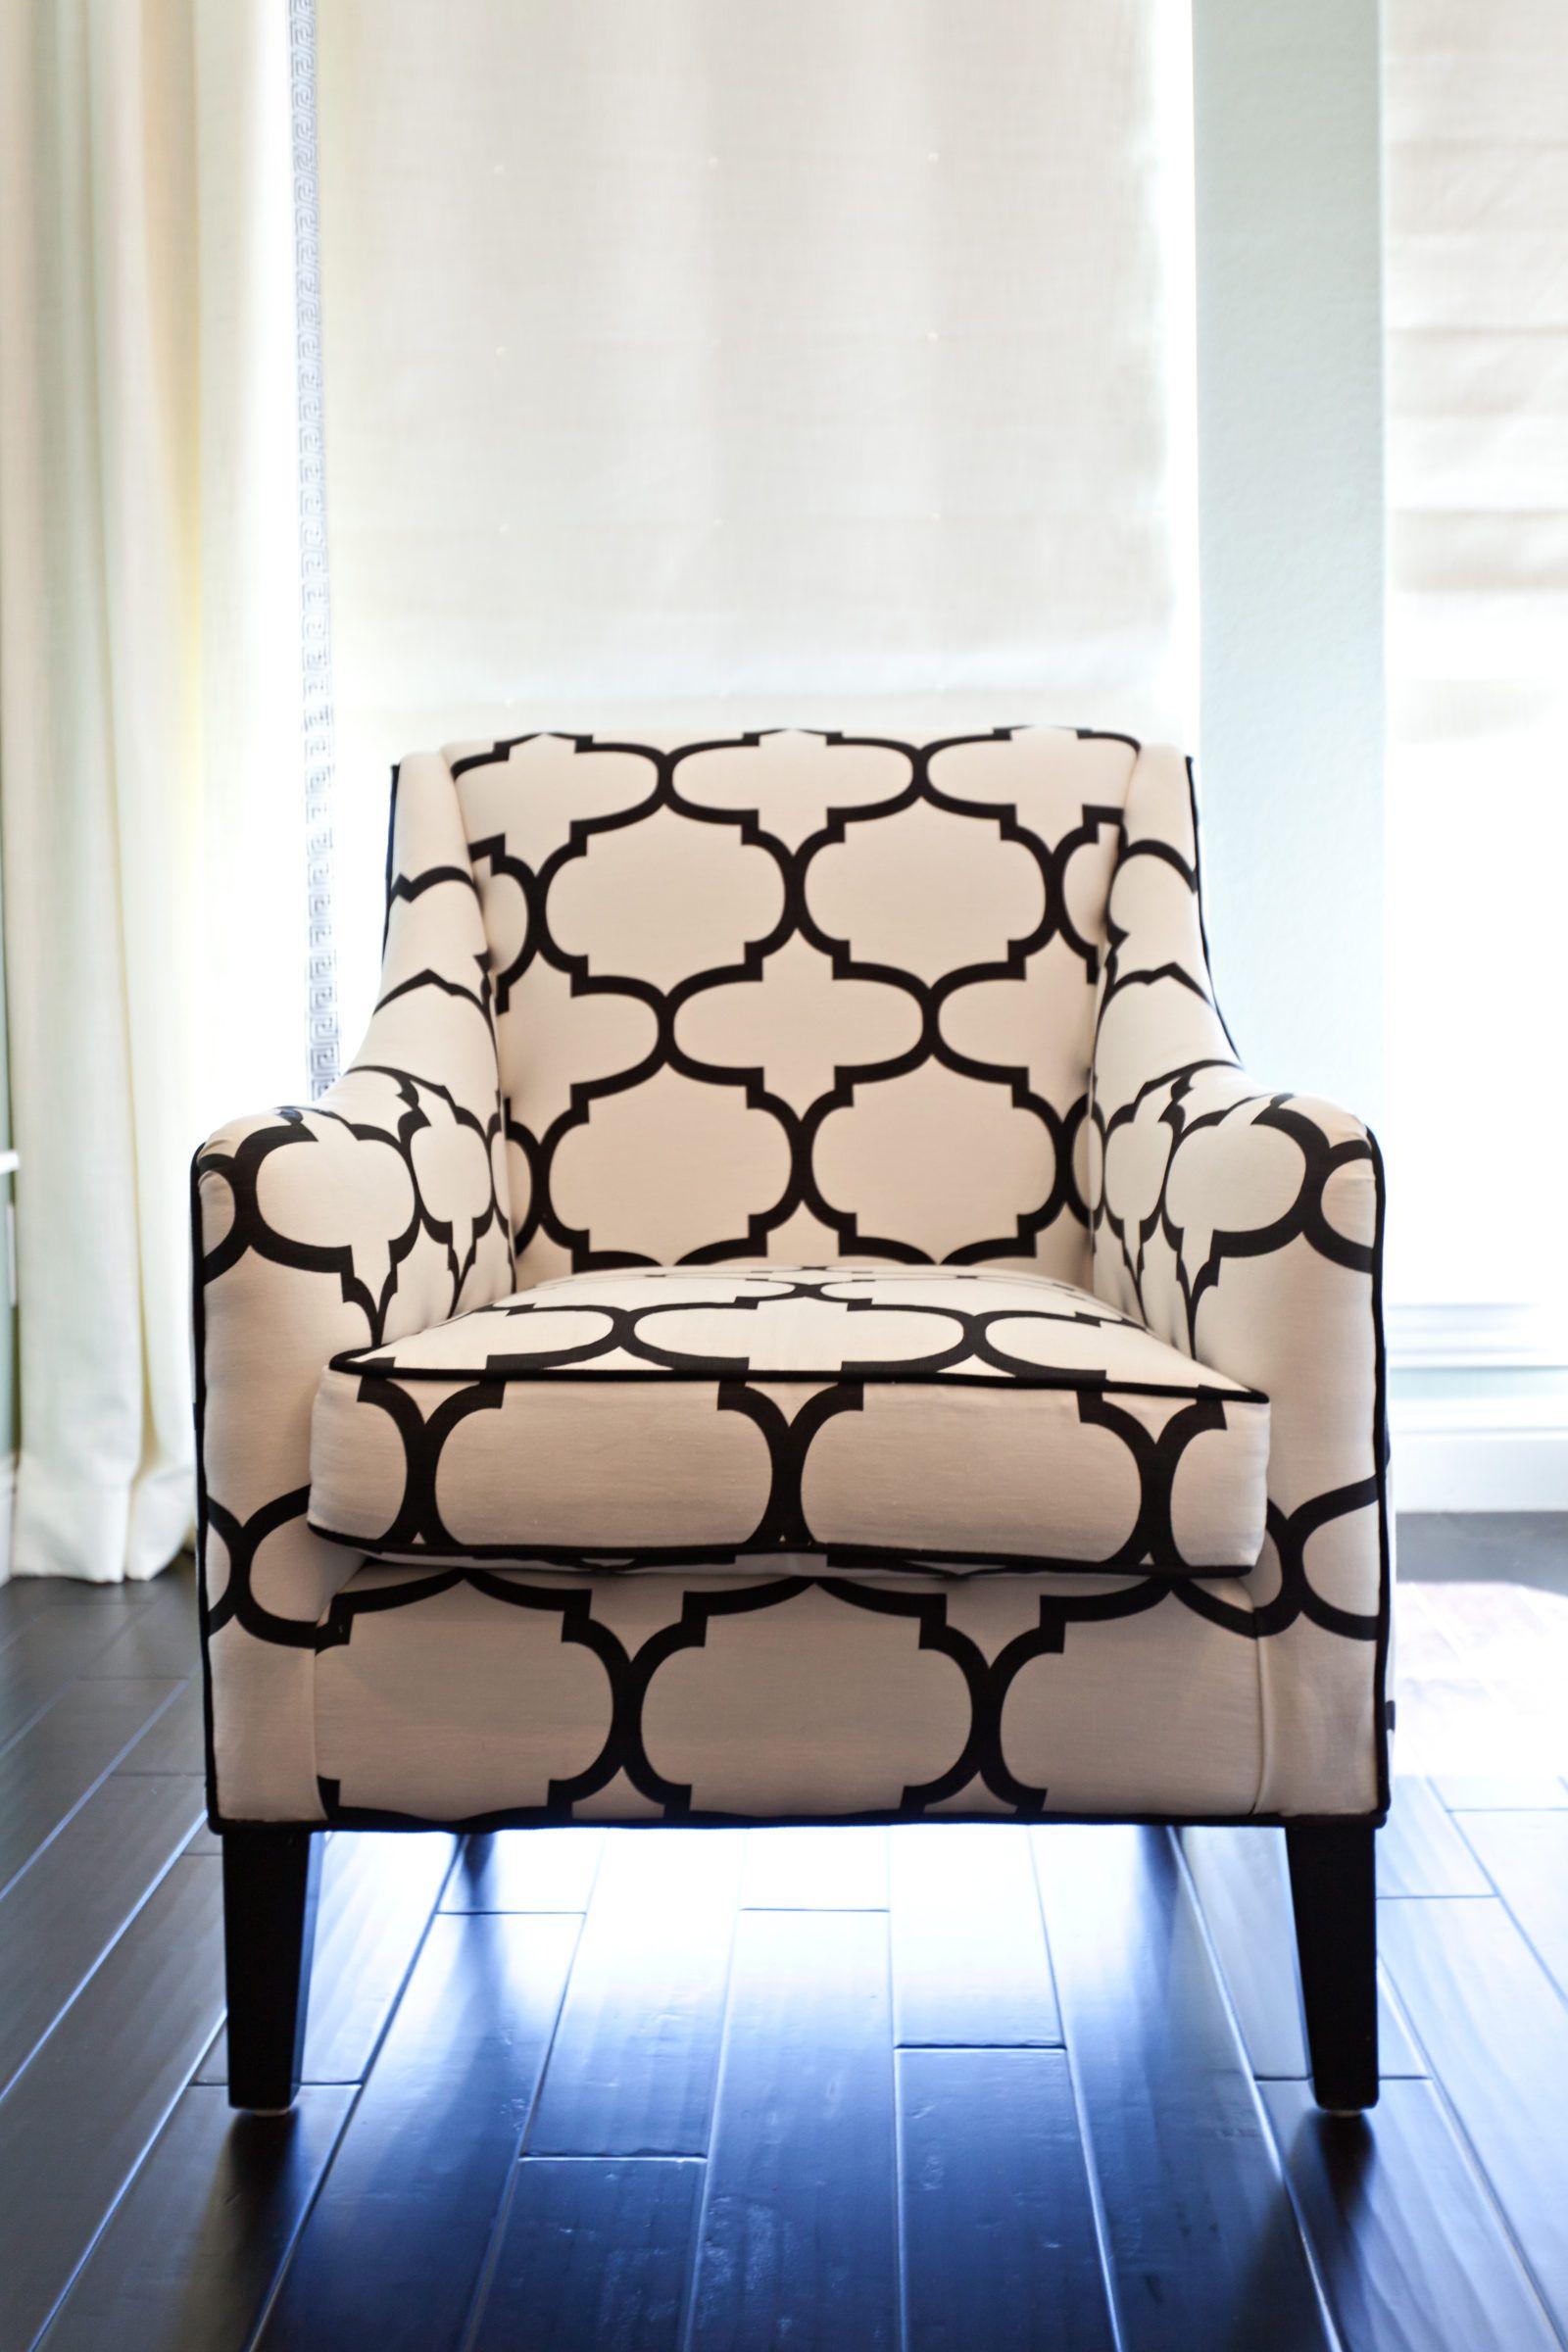 Dovita Dosemelik Kumas Istanbul Siyah Beyaz Desenli Kumas Instagram Dovitakumas Interiordesign Homede White Pattern Chair Living Room White White Chair